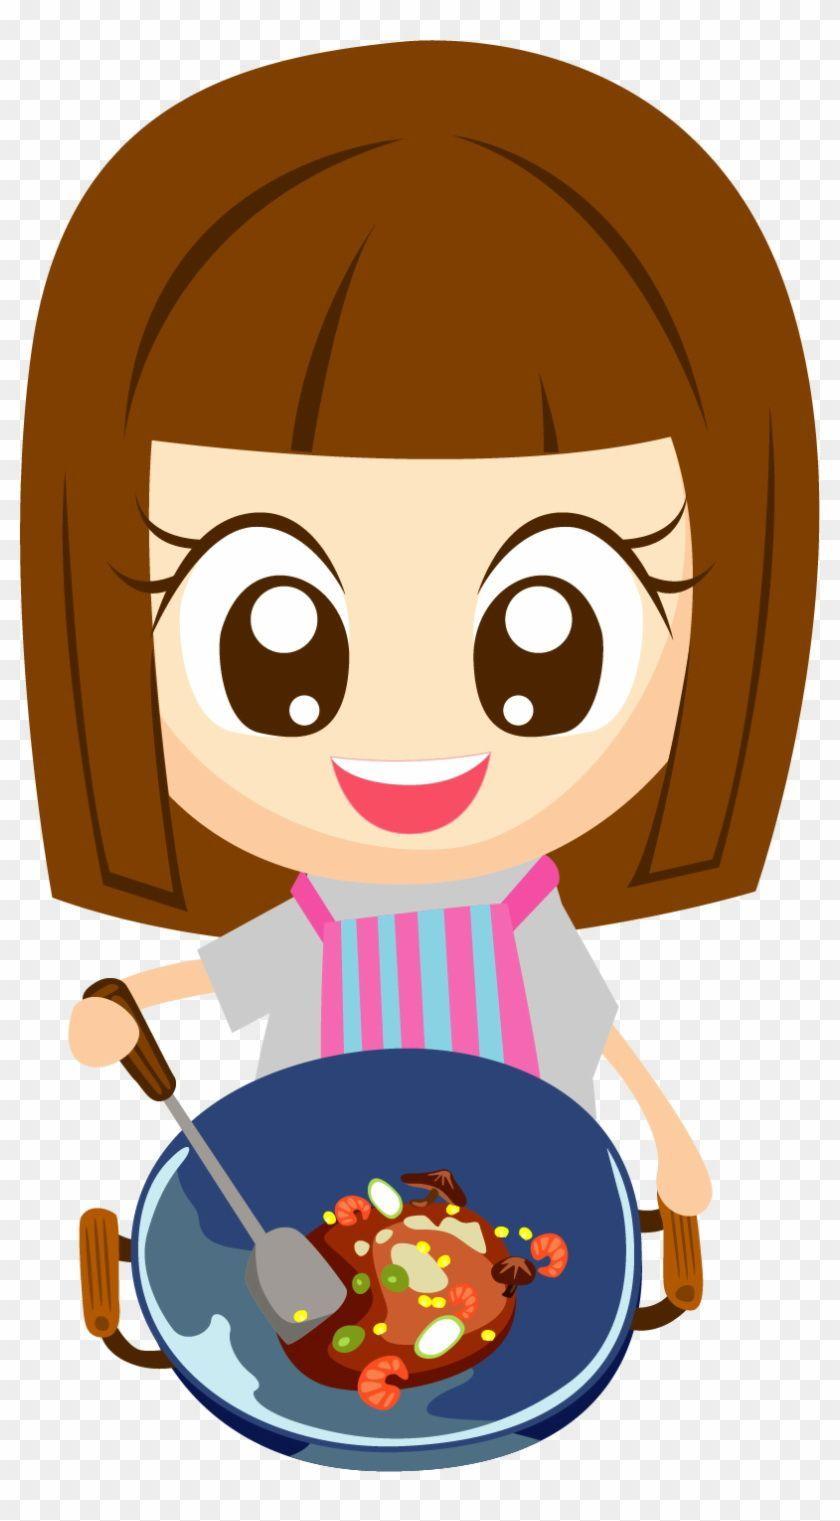 Cooking Cartoon Images : cooking, cartoon, images, Cartoon, #cooking, Aesthetic, Basics, Cooking,, Illustration,, Illustration